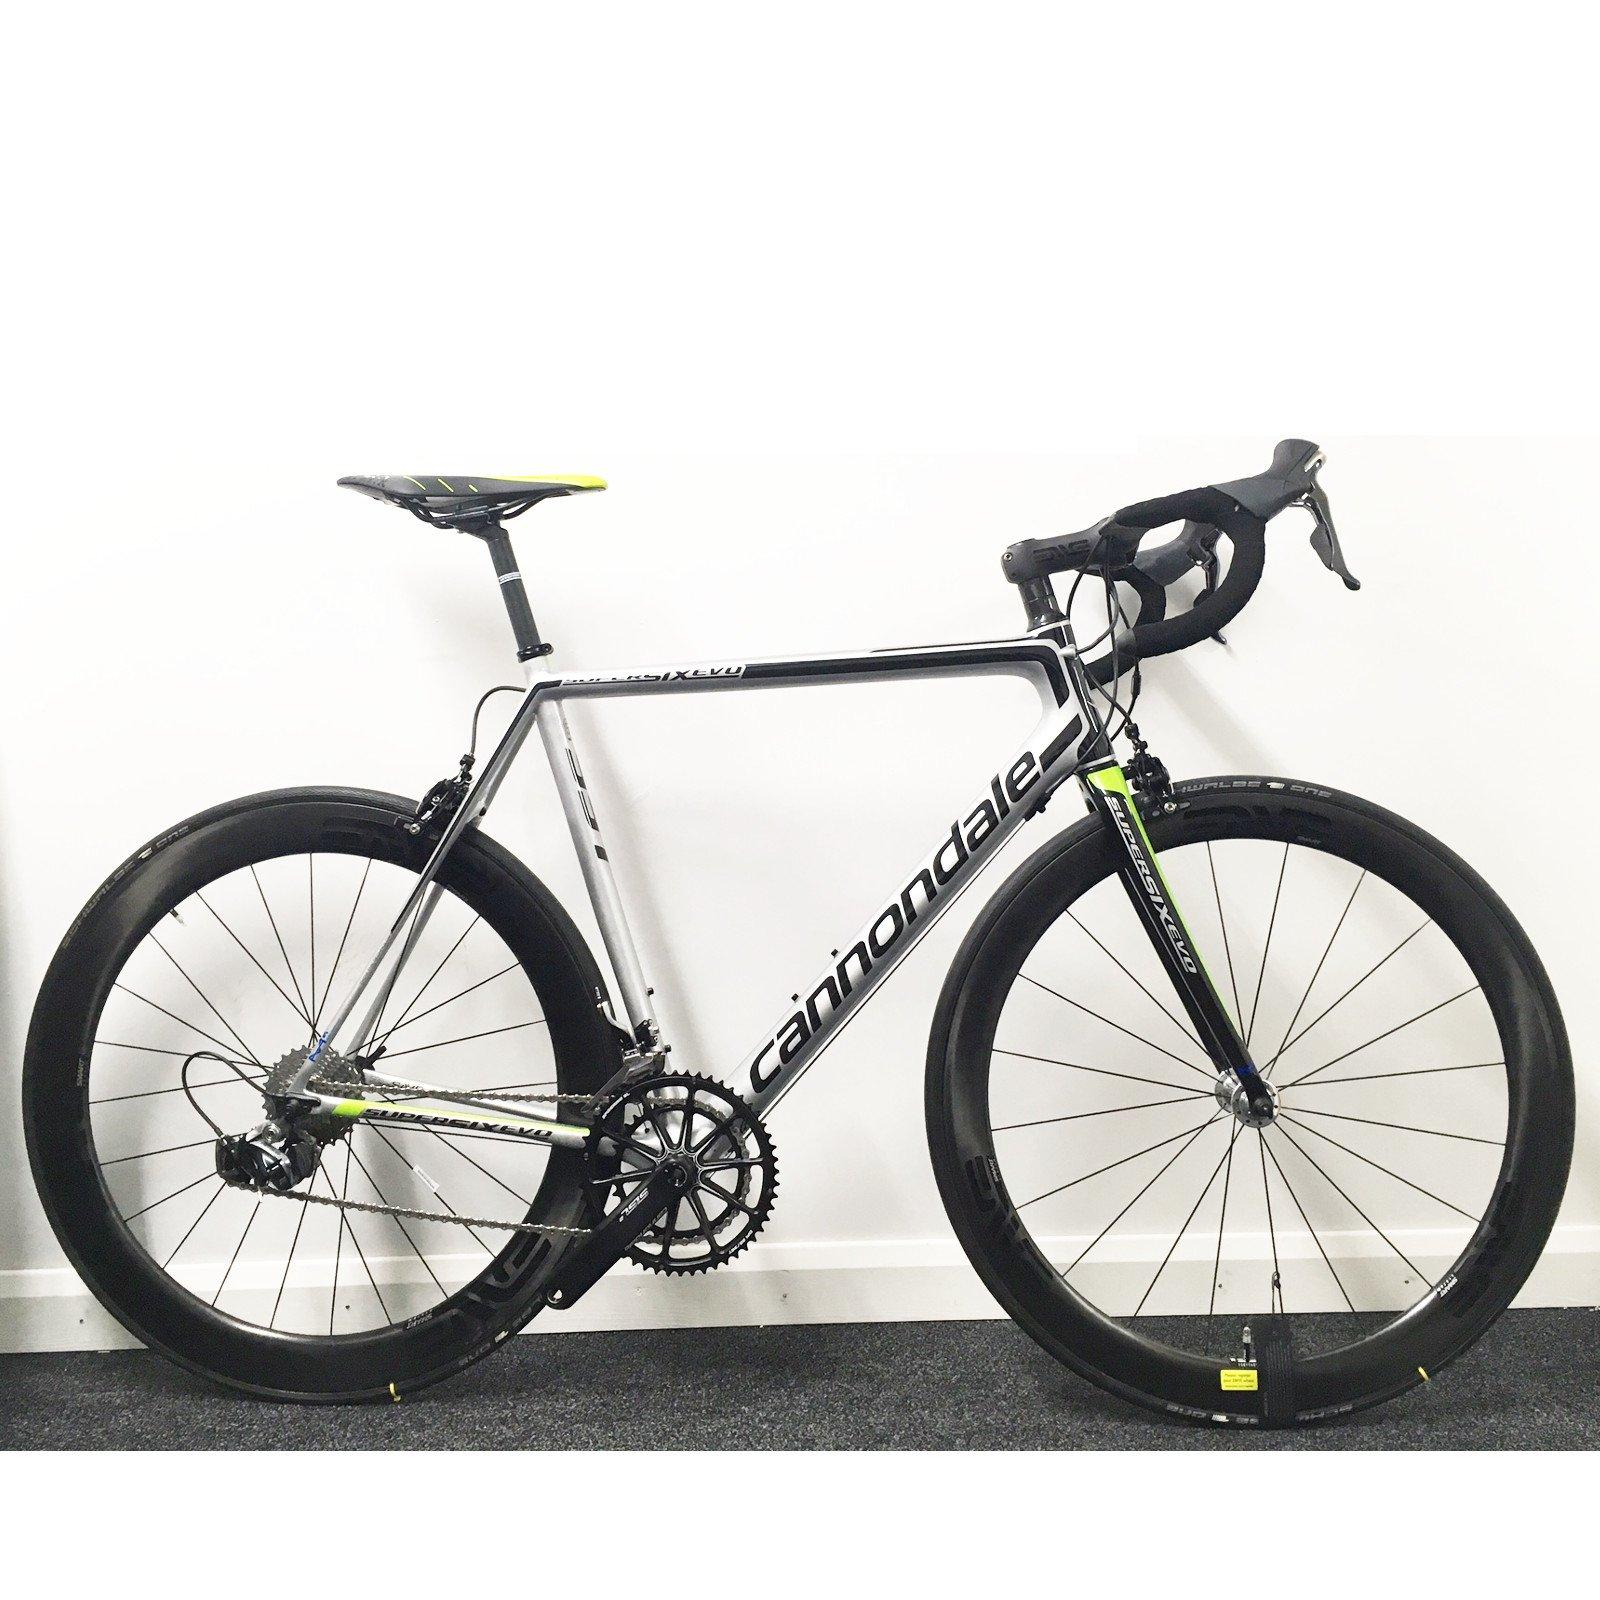 Cannondale – Super 6 Evo hi-mod carbono negro INC. 2016 bicicleta ...